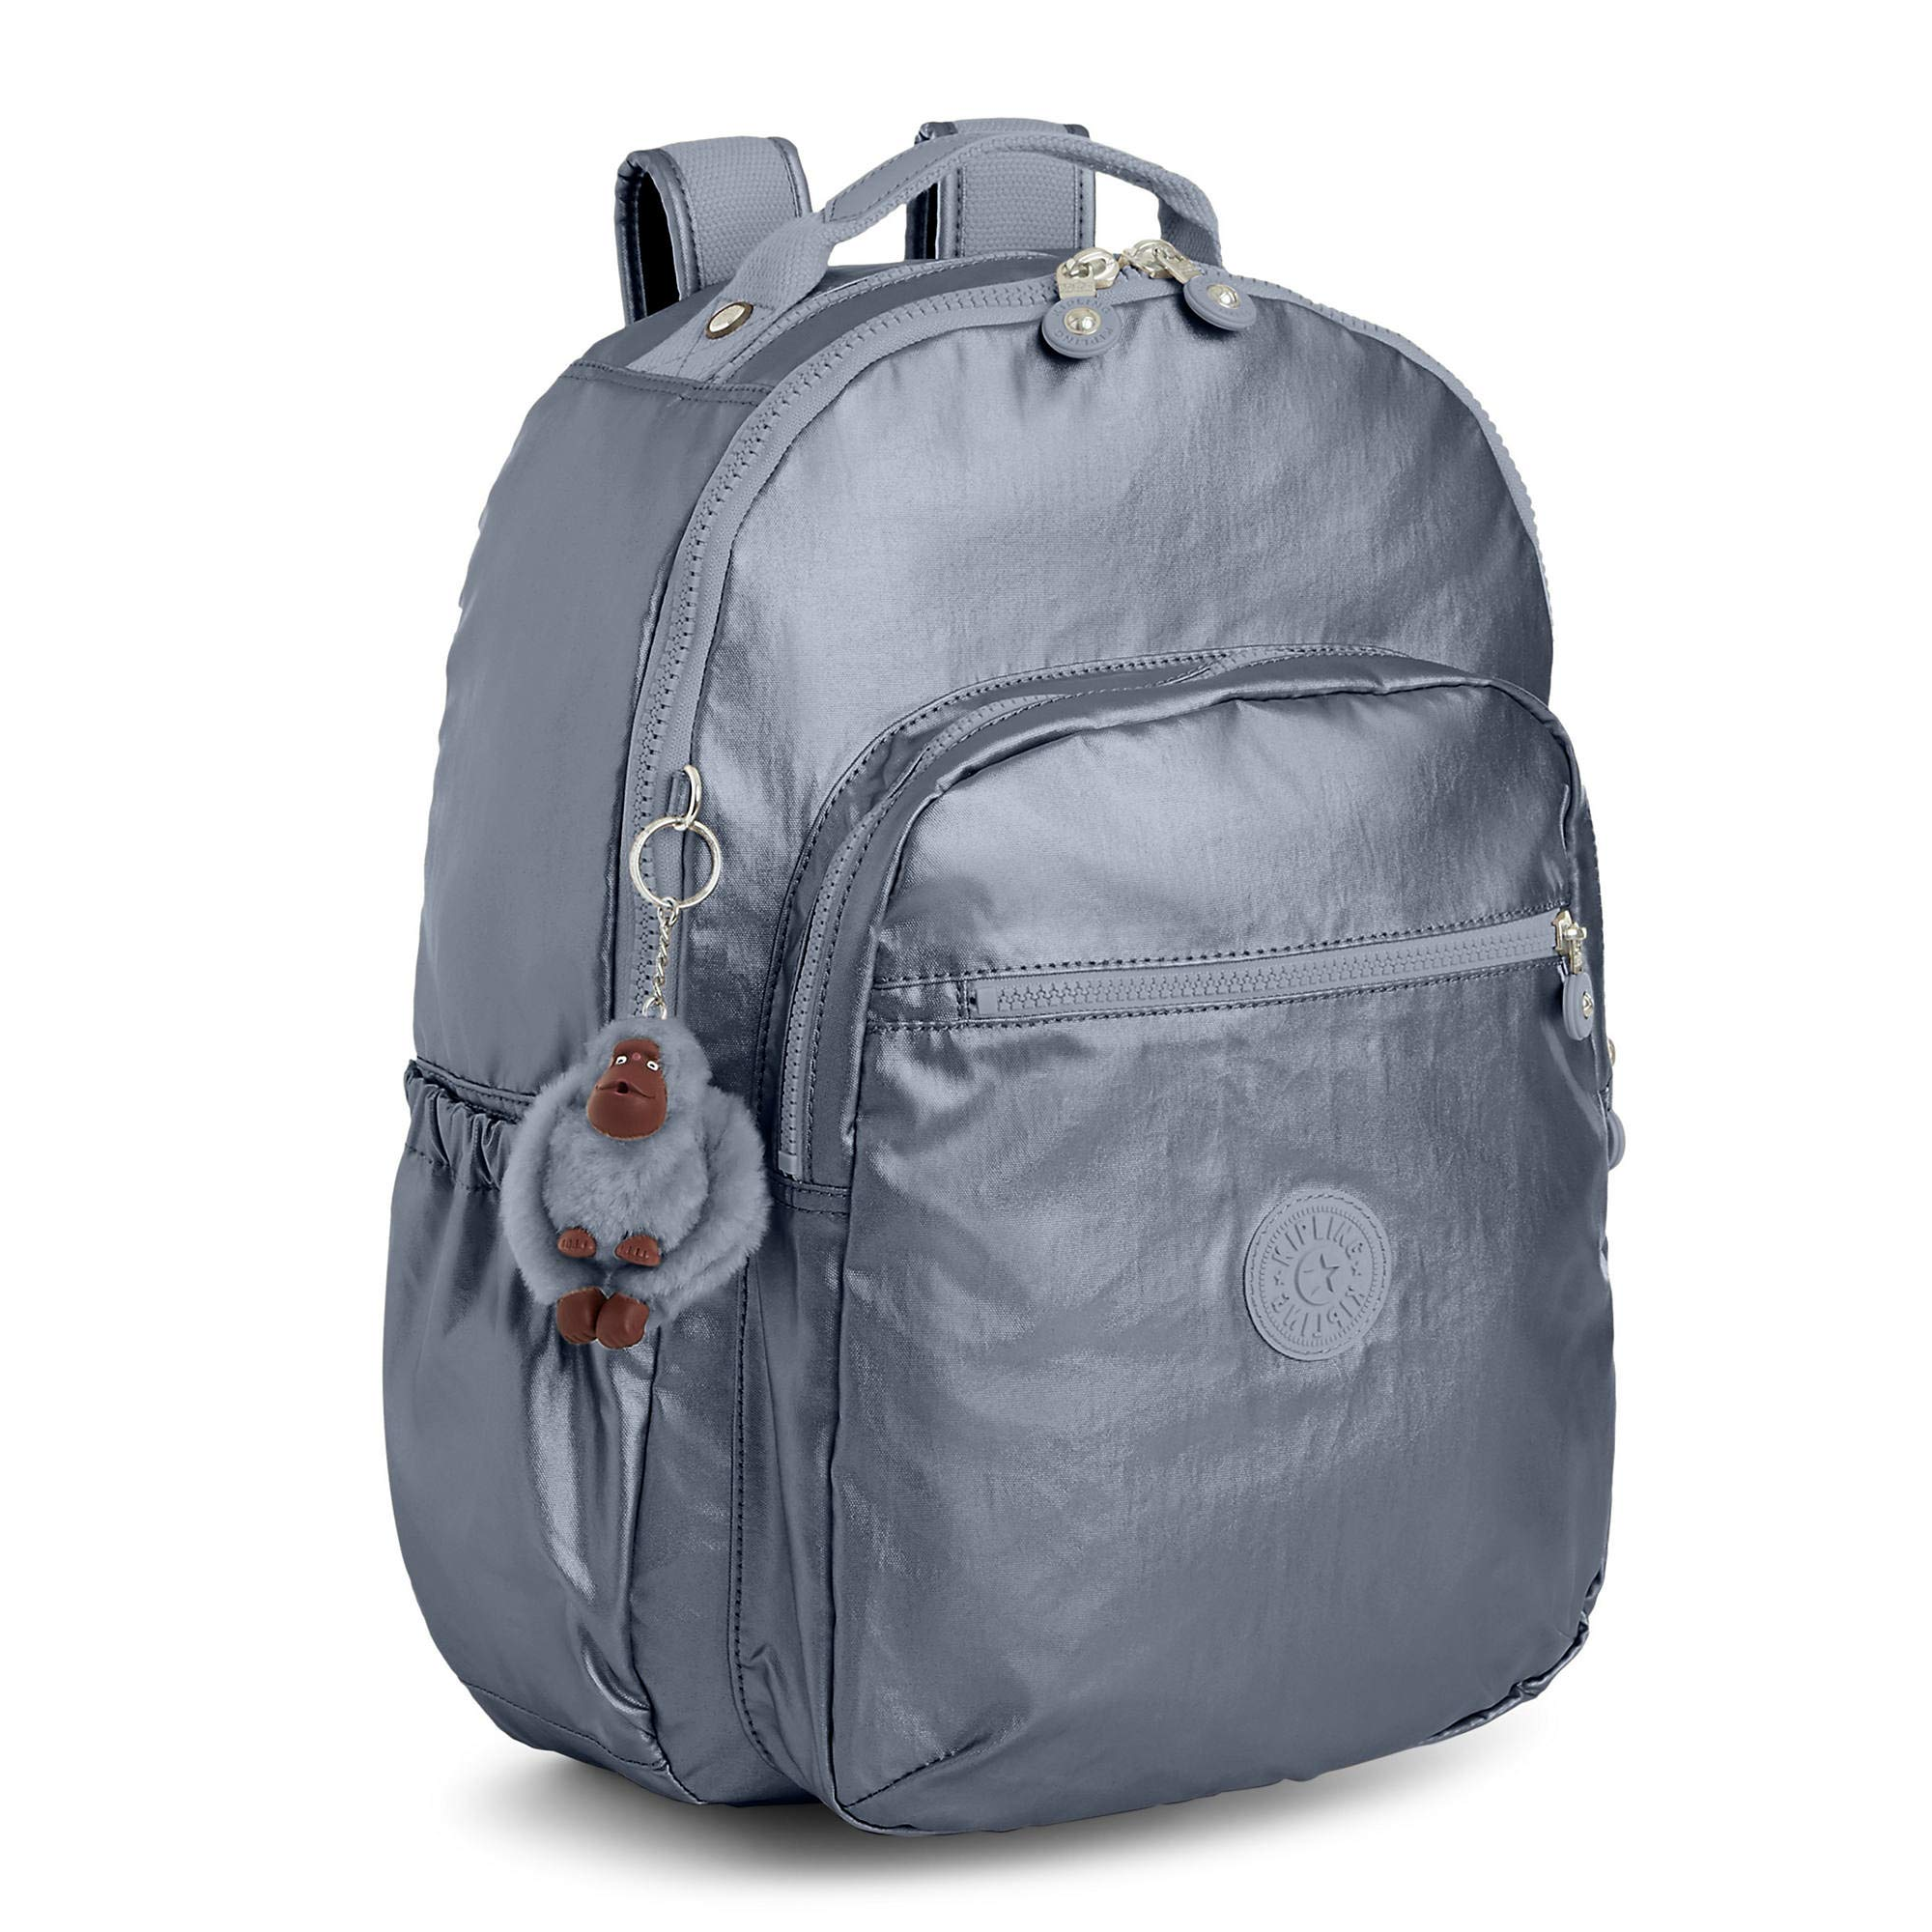 Kipling Seoul Go Large Metallic 15'' Laptop Backpack One Size Steel Grey Metallic by Kipling (Image #2)